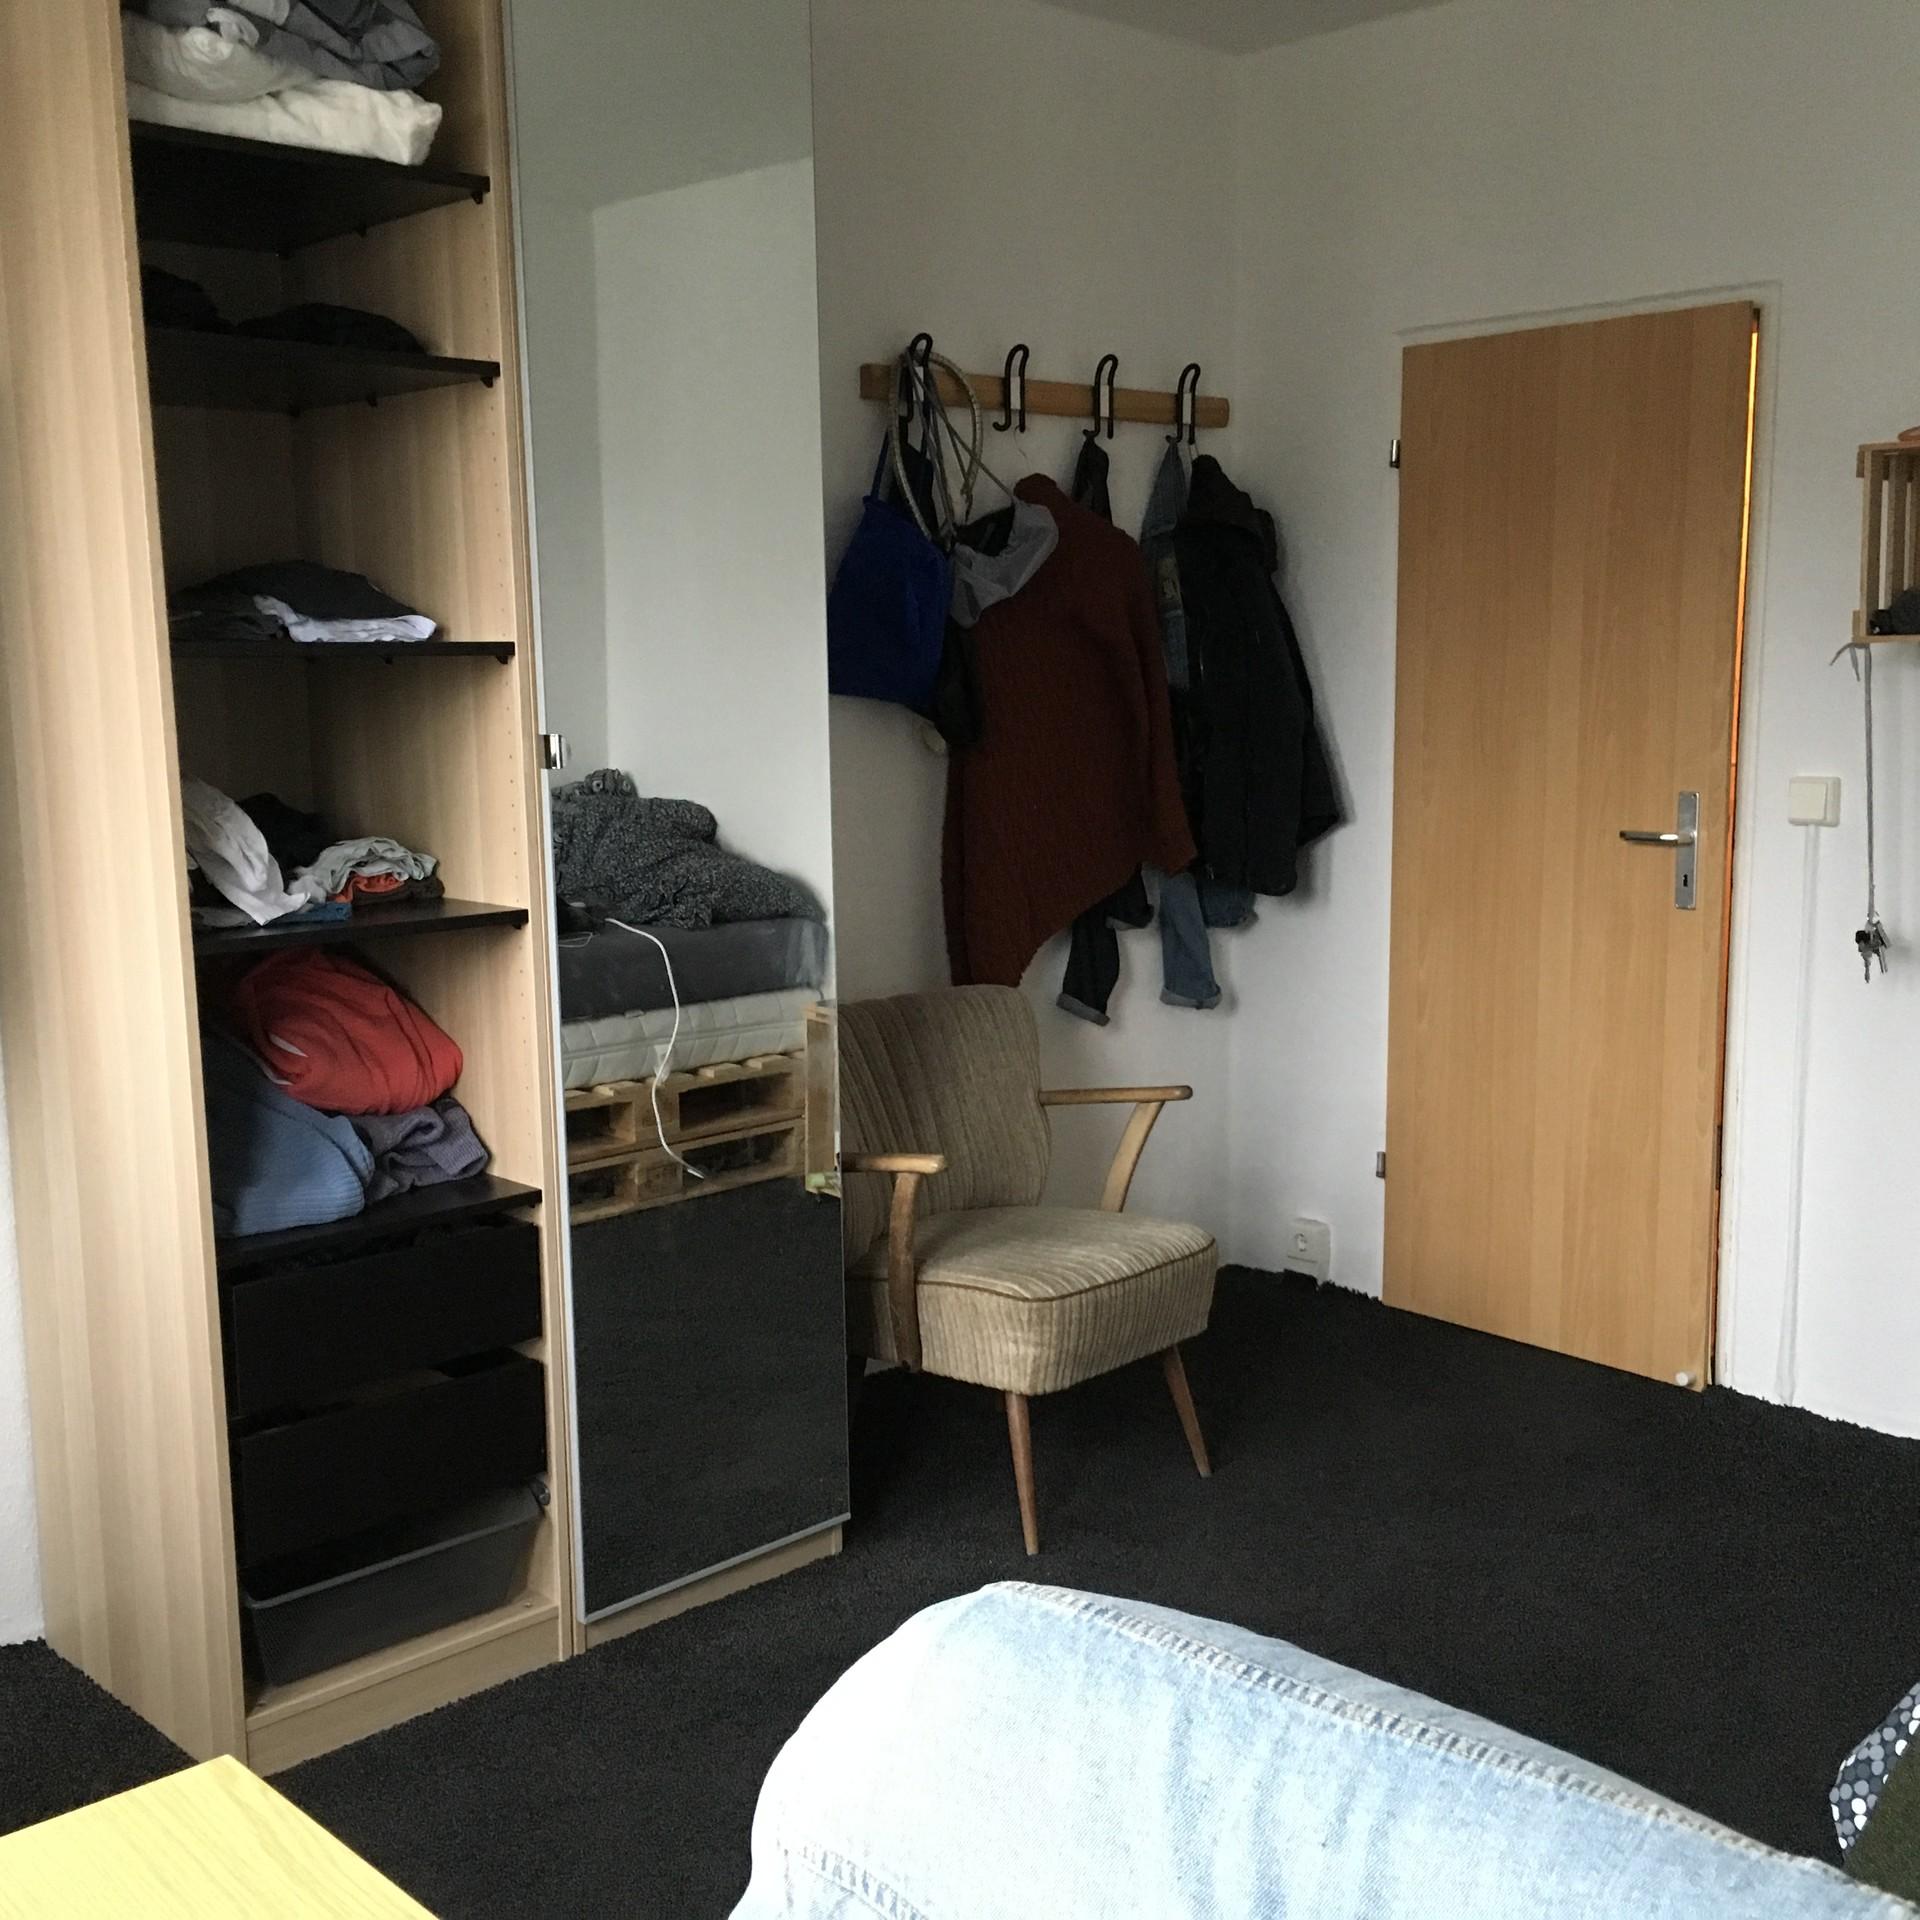 confortable-room-center-dresden-e577c5b25c7dea4c43c6207df186e826